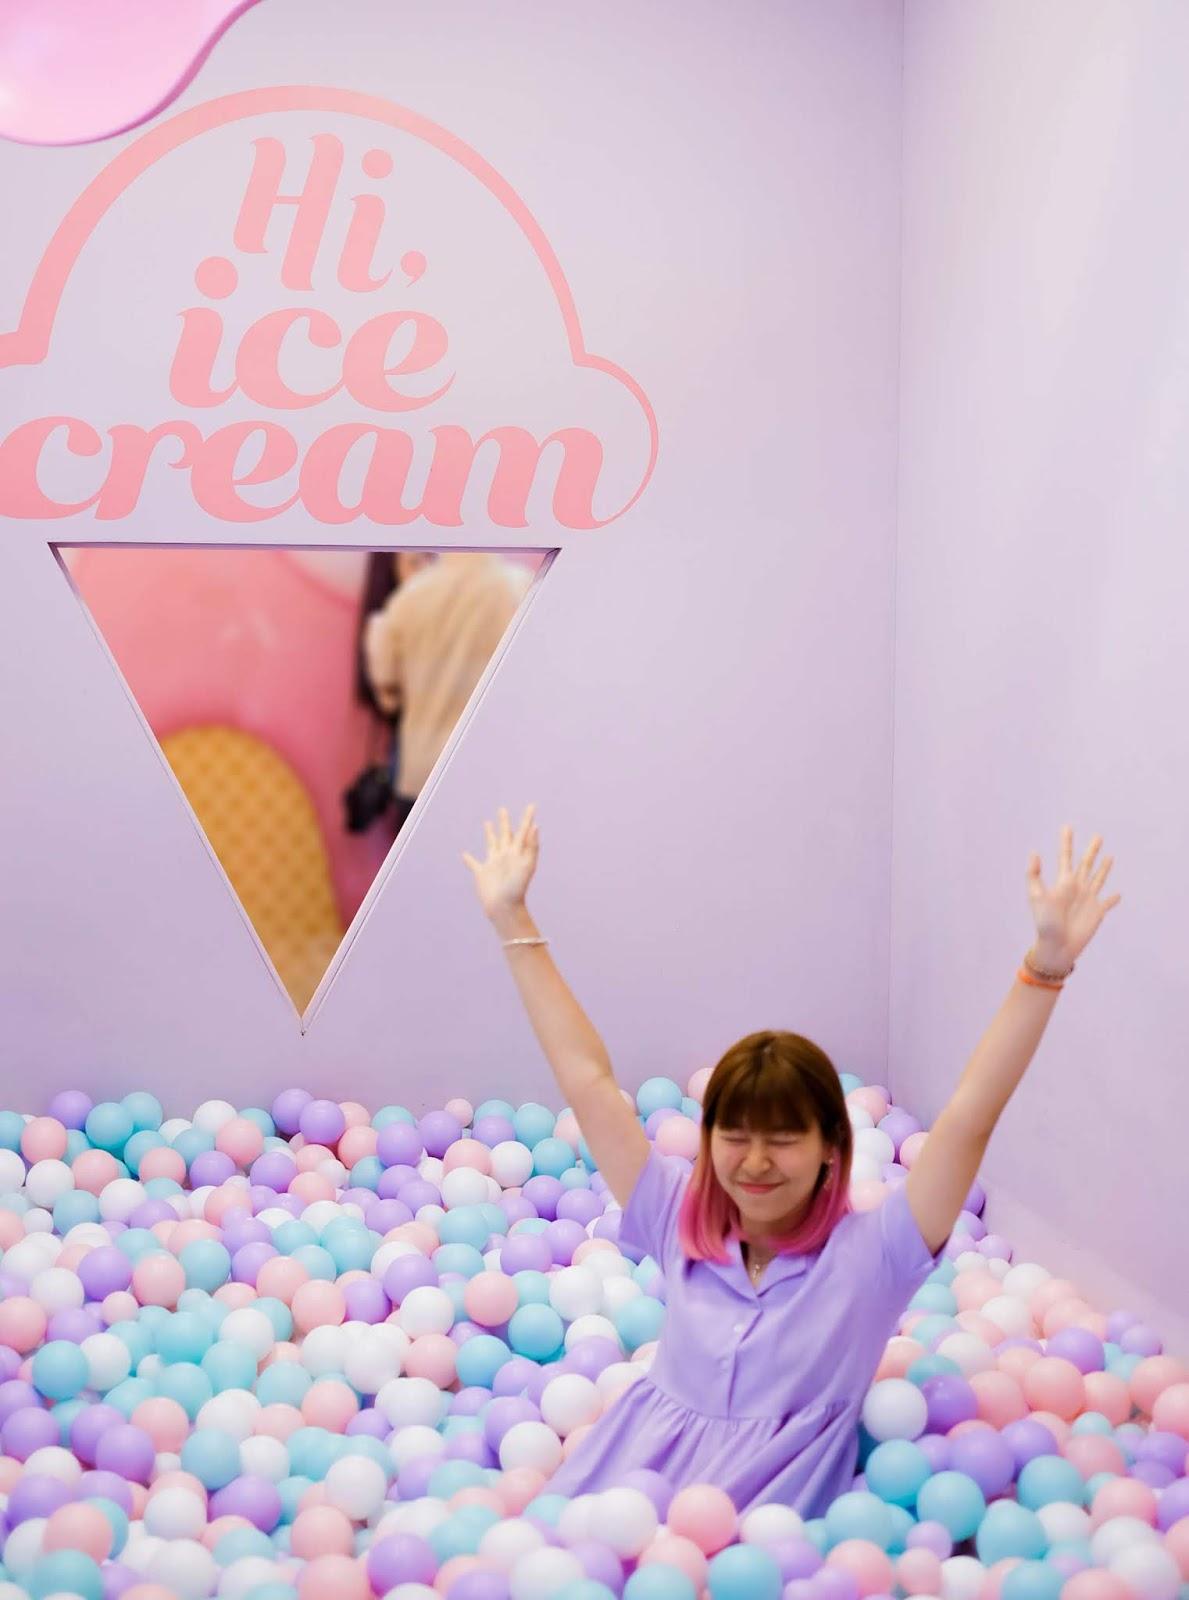 Hi Ice Cream Exhibition Ball Pool | www.bigdreamerblog.com